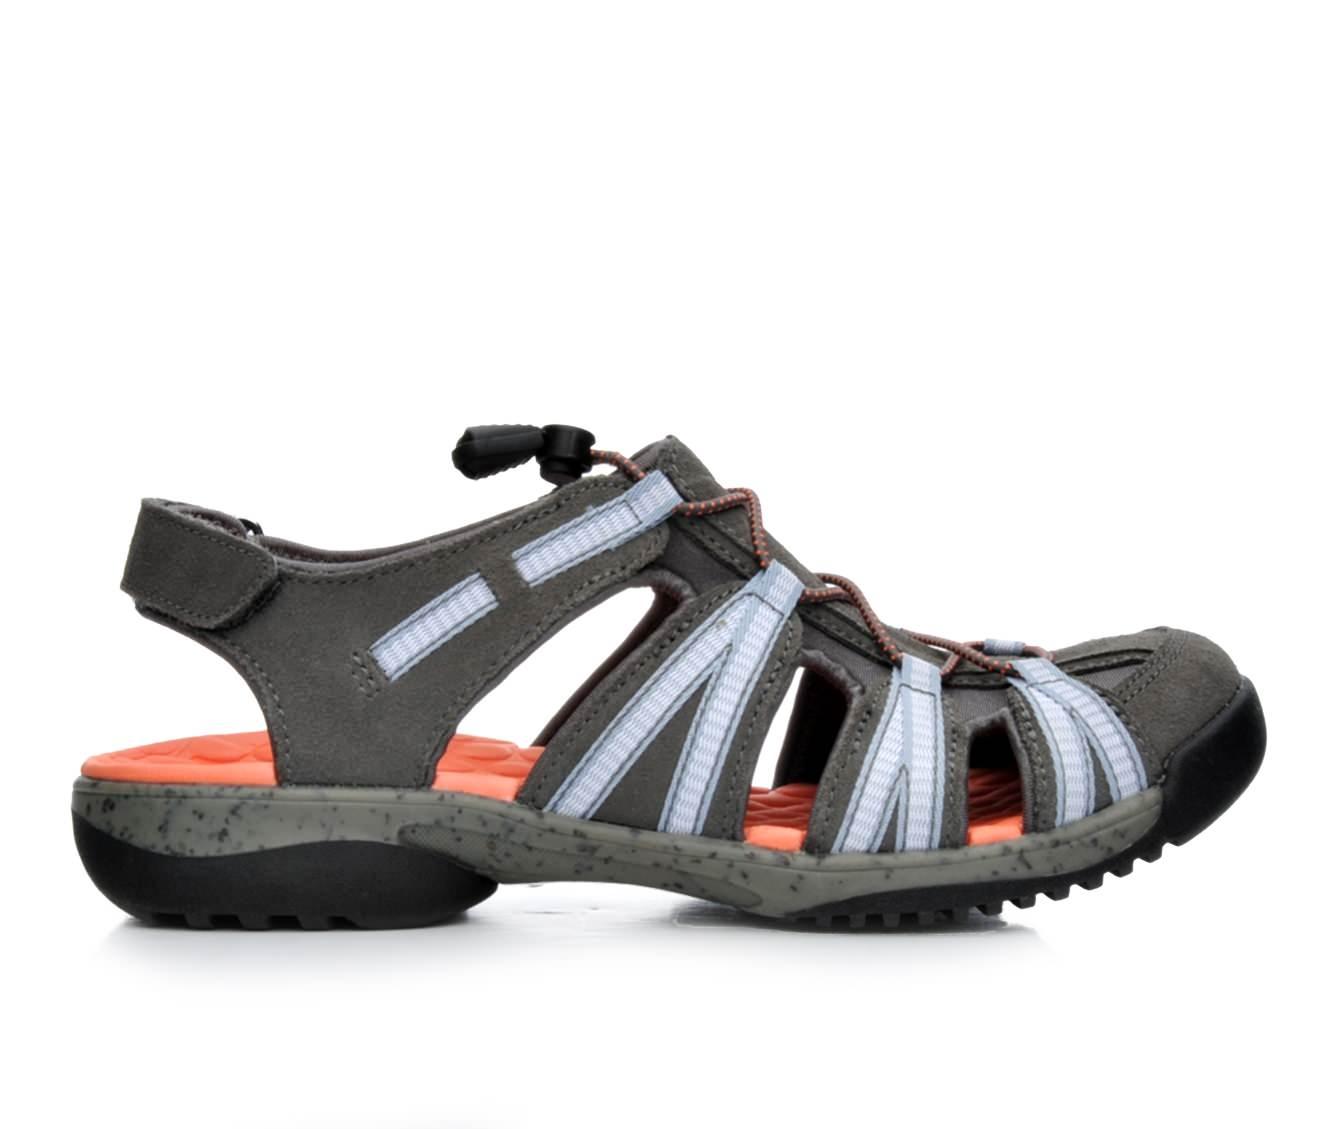 Women's Clarks Tuvia Maddee Sandals (Grey)